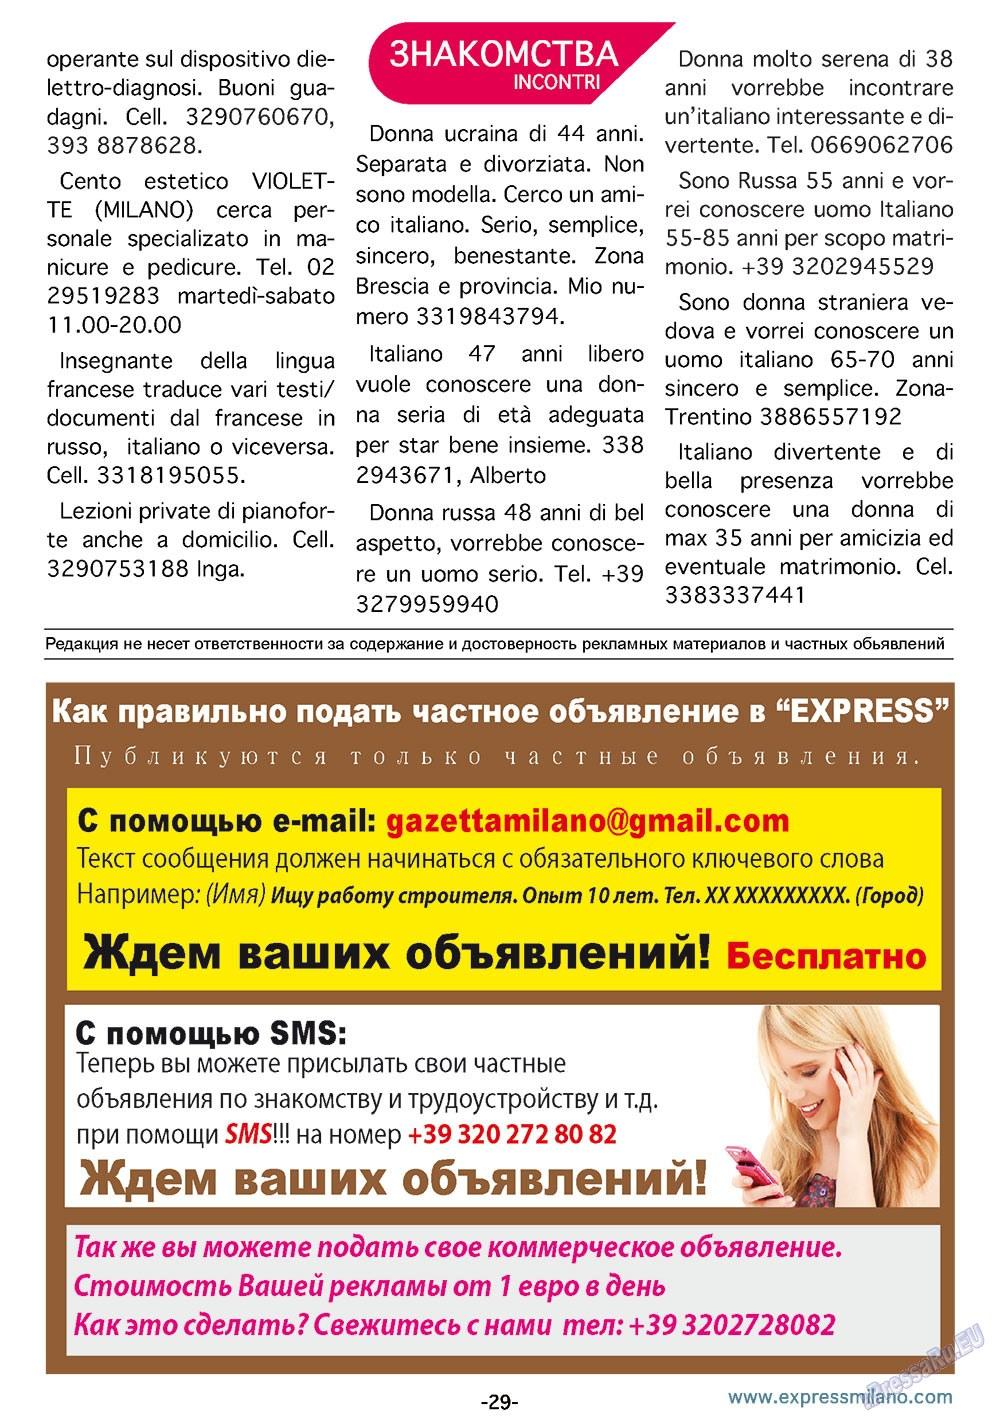 ExPress (журнал). 2012 год, номер 1, стр. 29